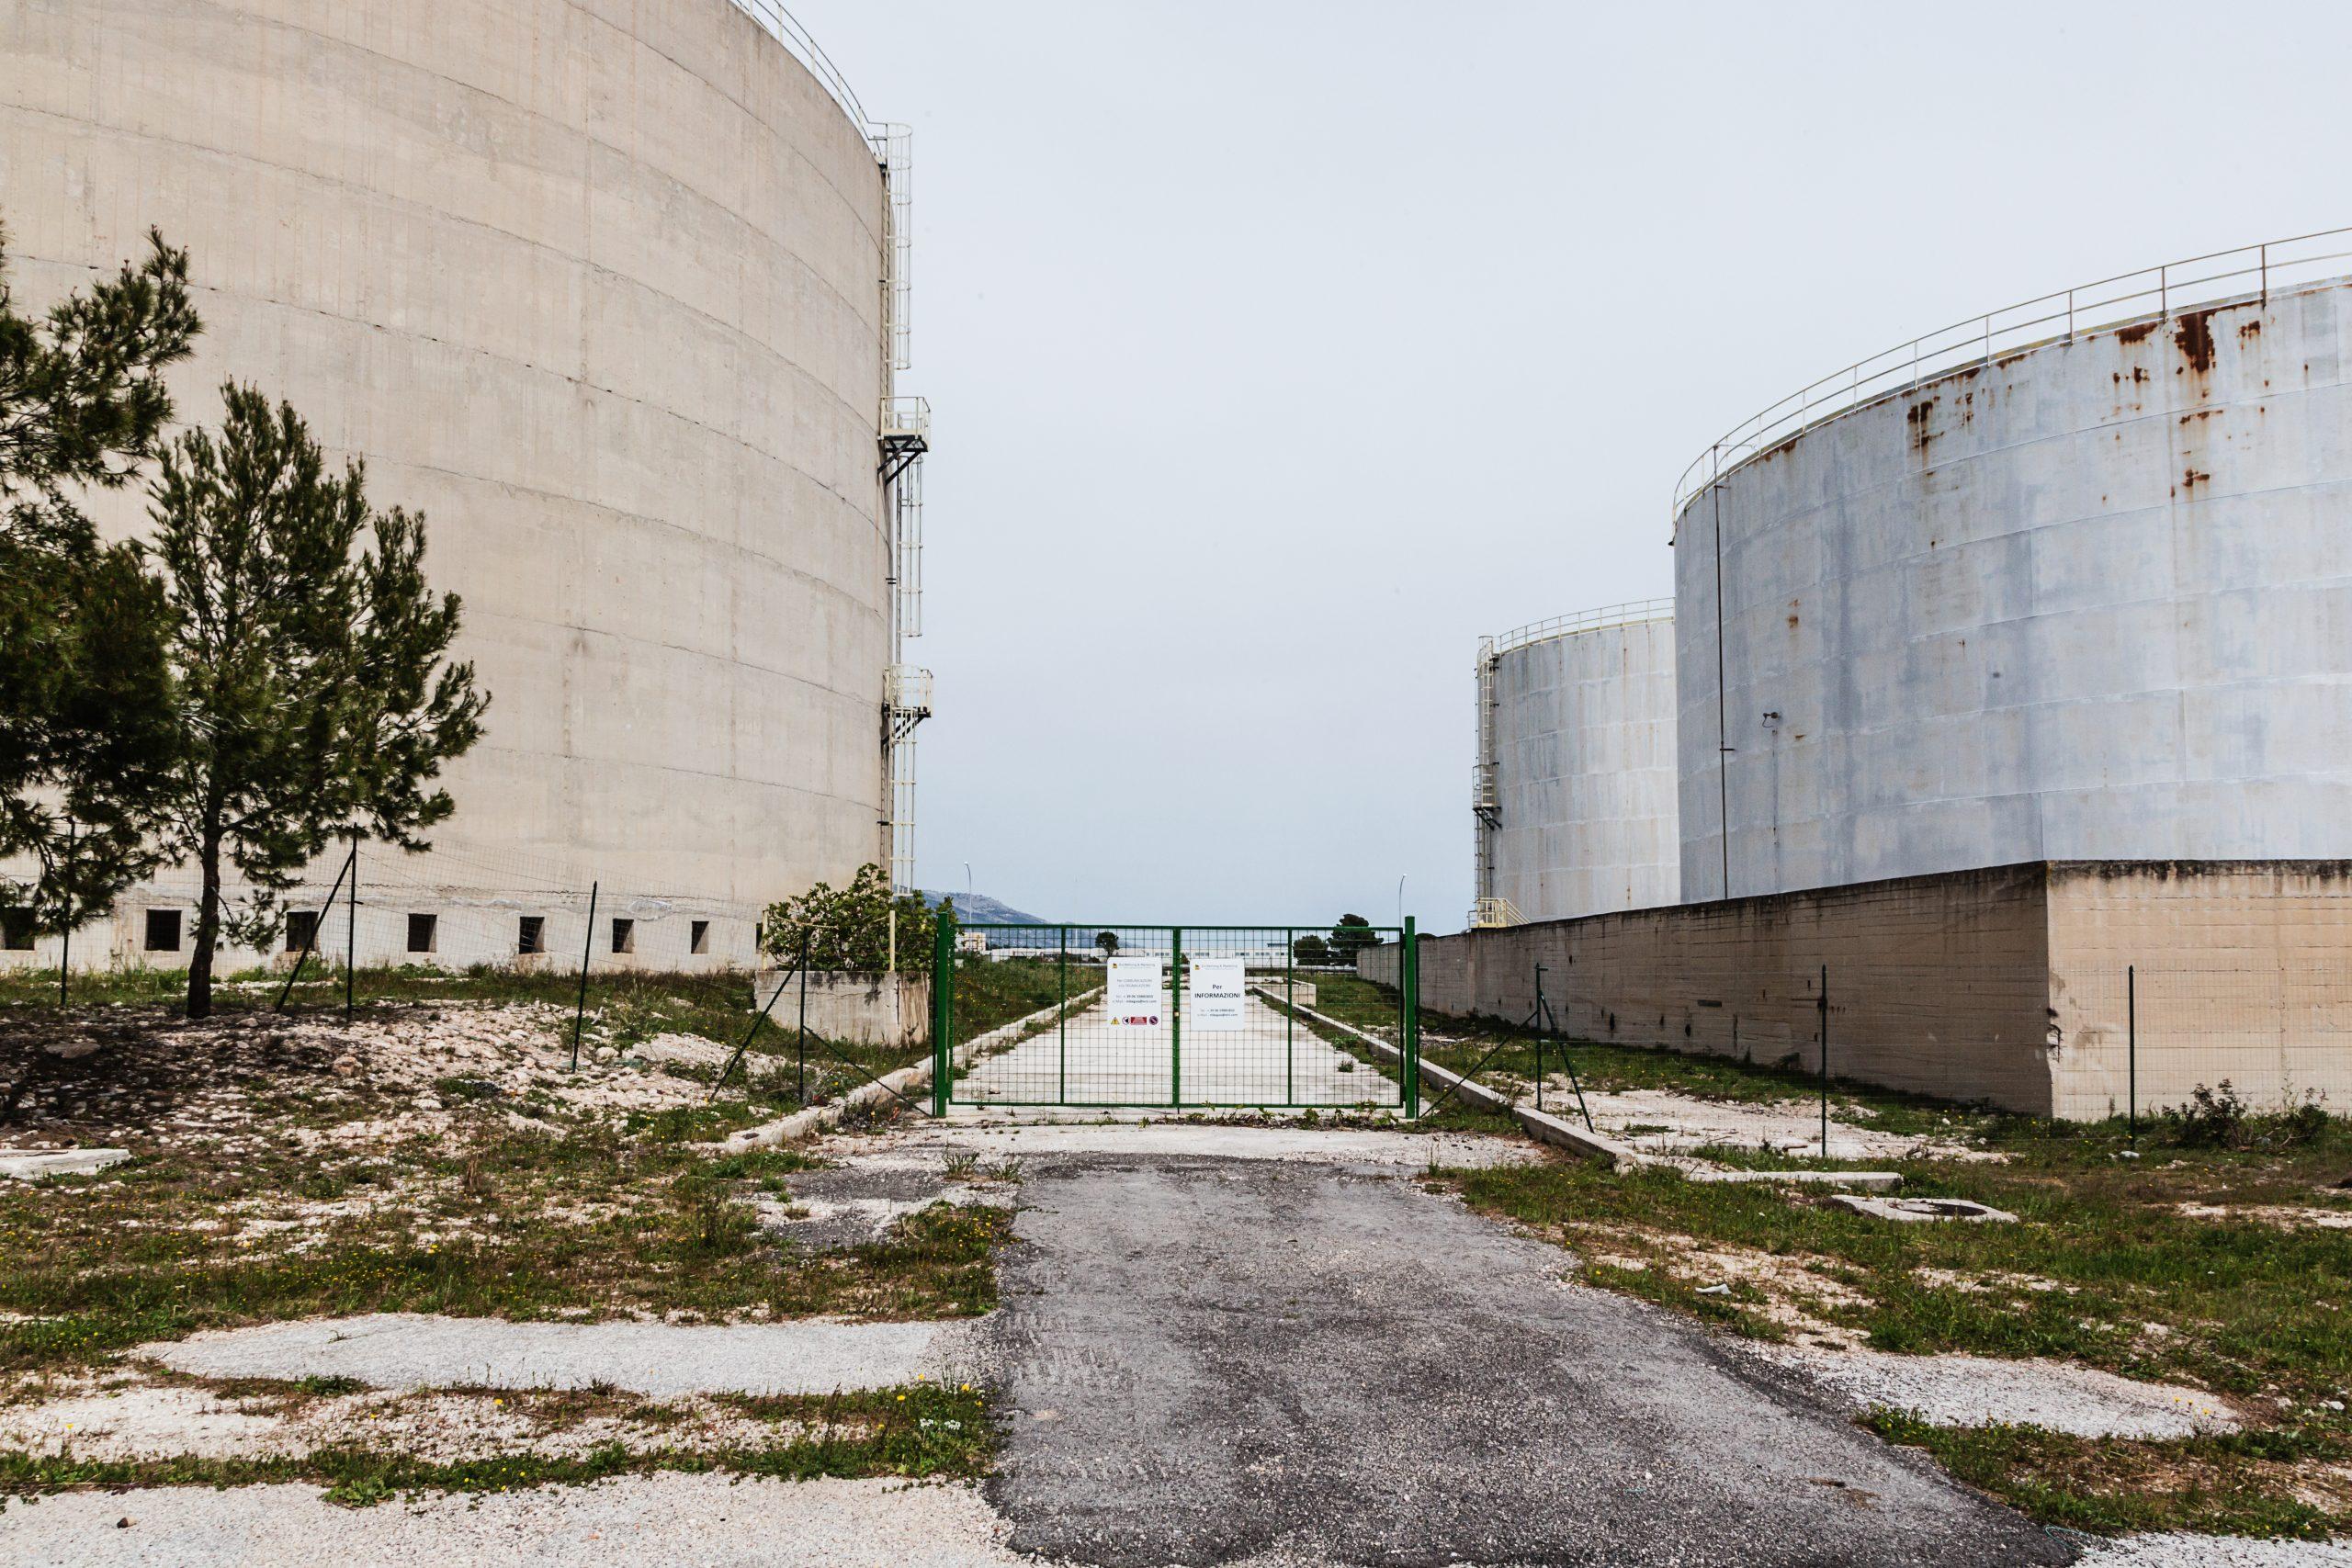 Manfredonia, zona industriale - torre in disuso dell'ex EnicChem.